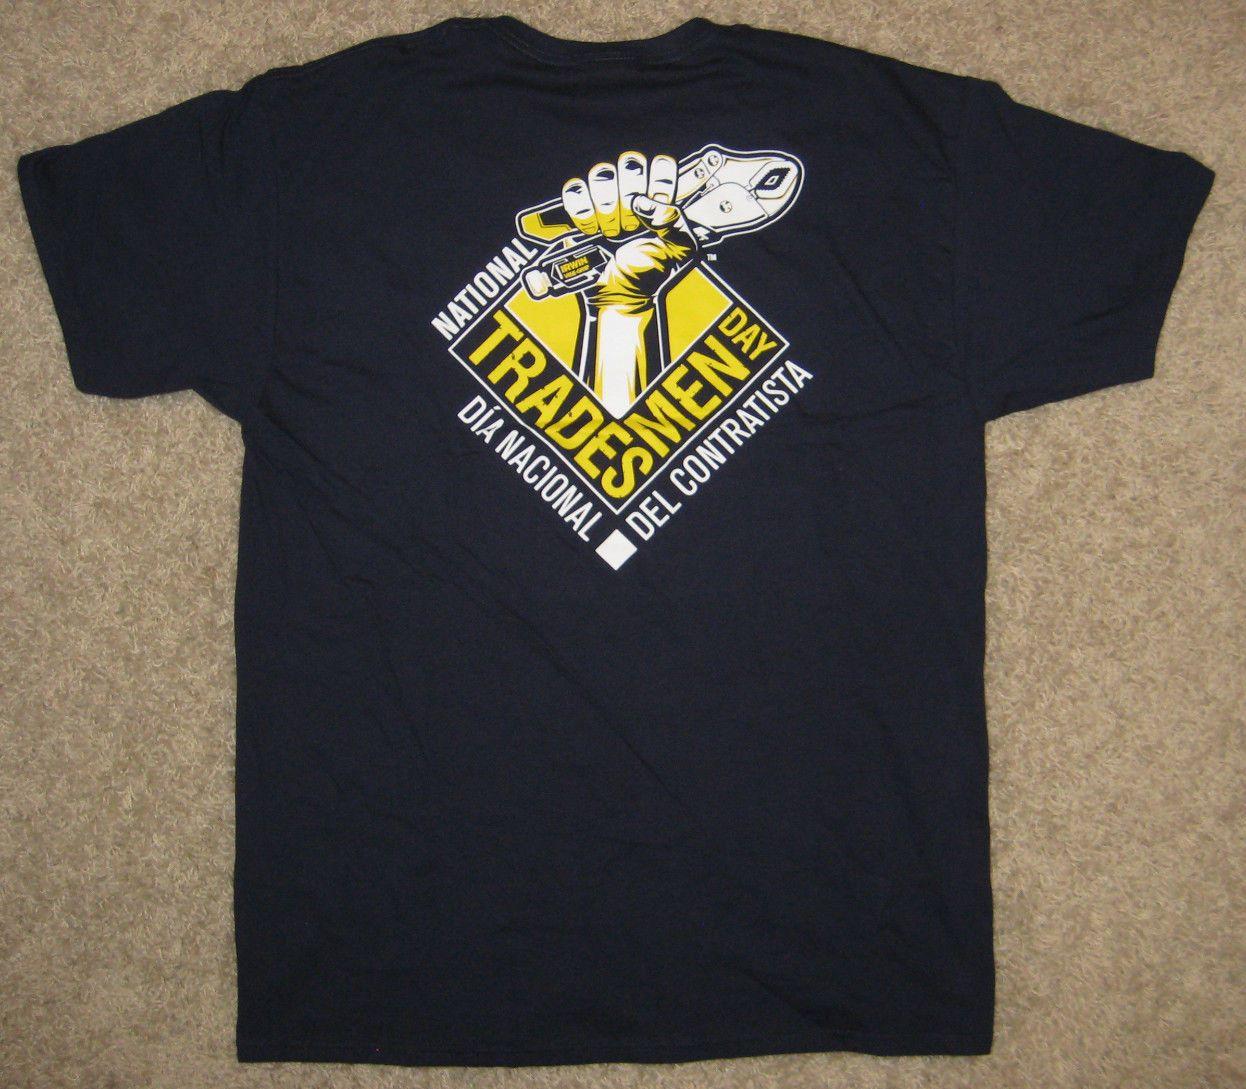 3597e2c5918e IRWIN Tools ~ National Tradesmen Day ~ T Shirt, Fruit Of The Loom 100%  Cotton L Men Women Unisex Fashion Tshirt Hilarious T Shirts Designer T Shirt  From ...